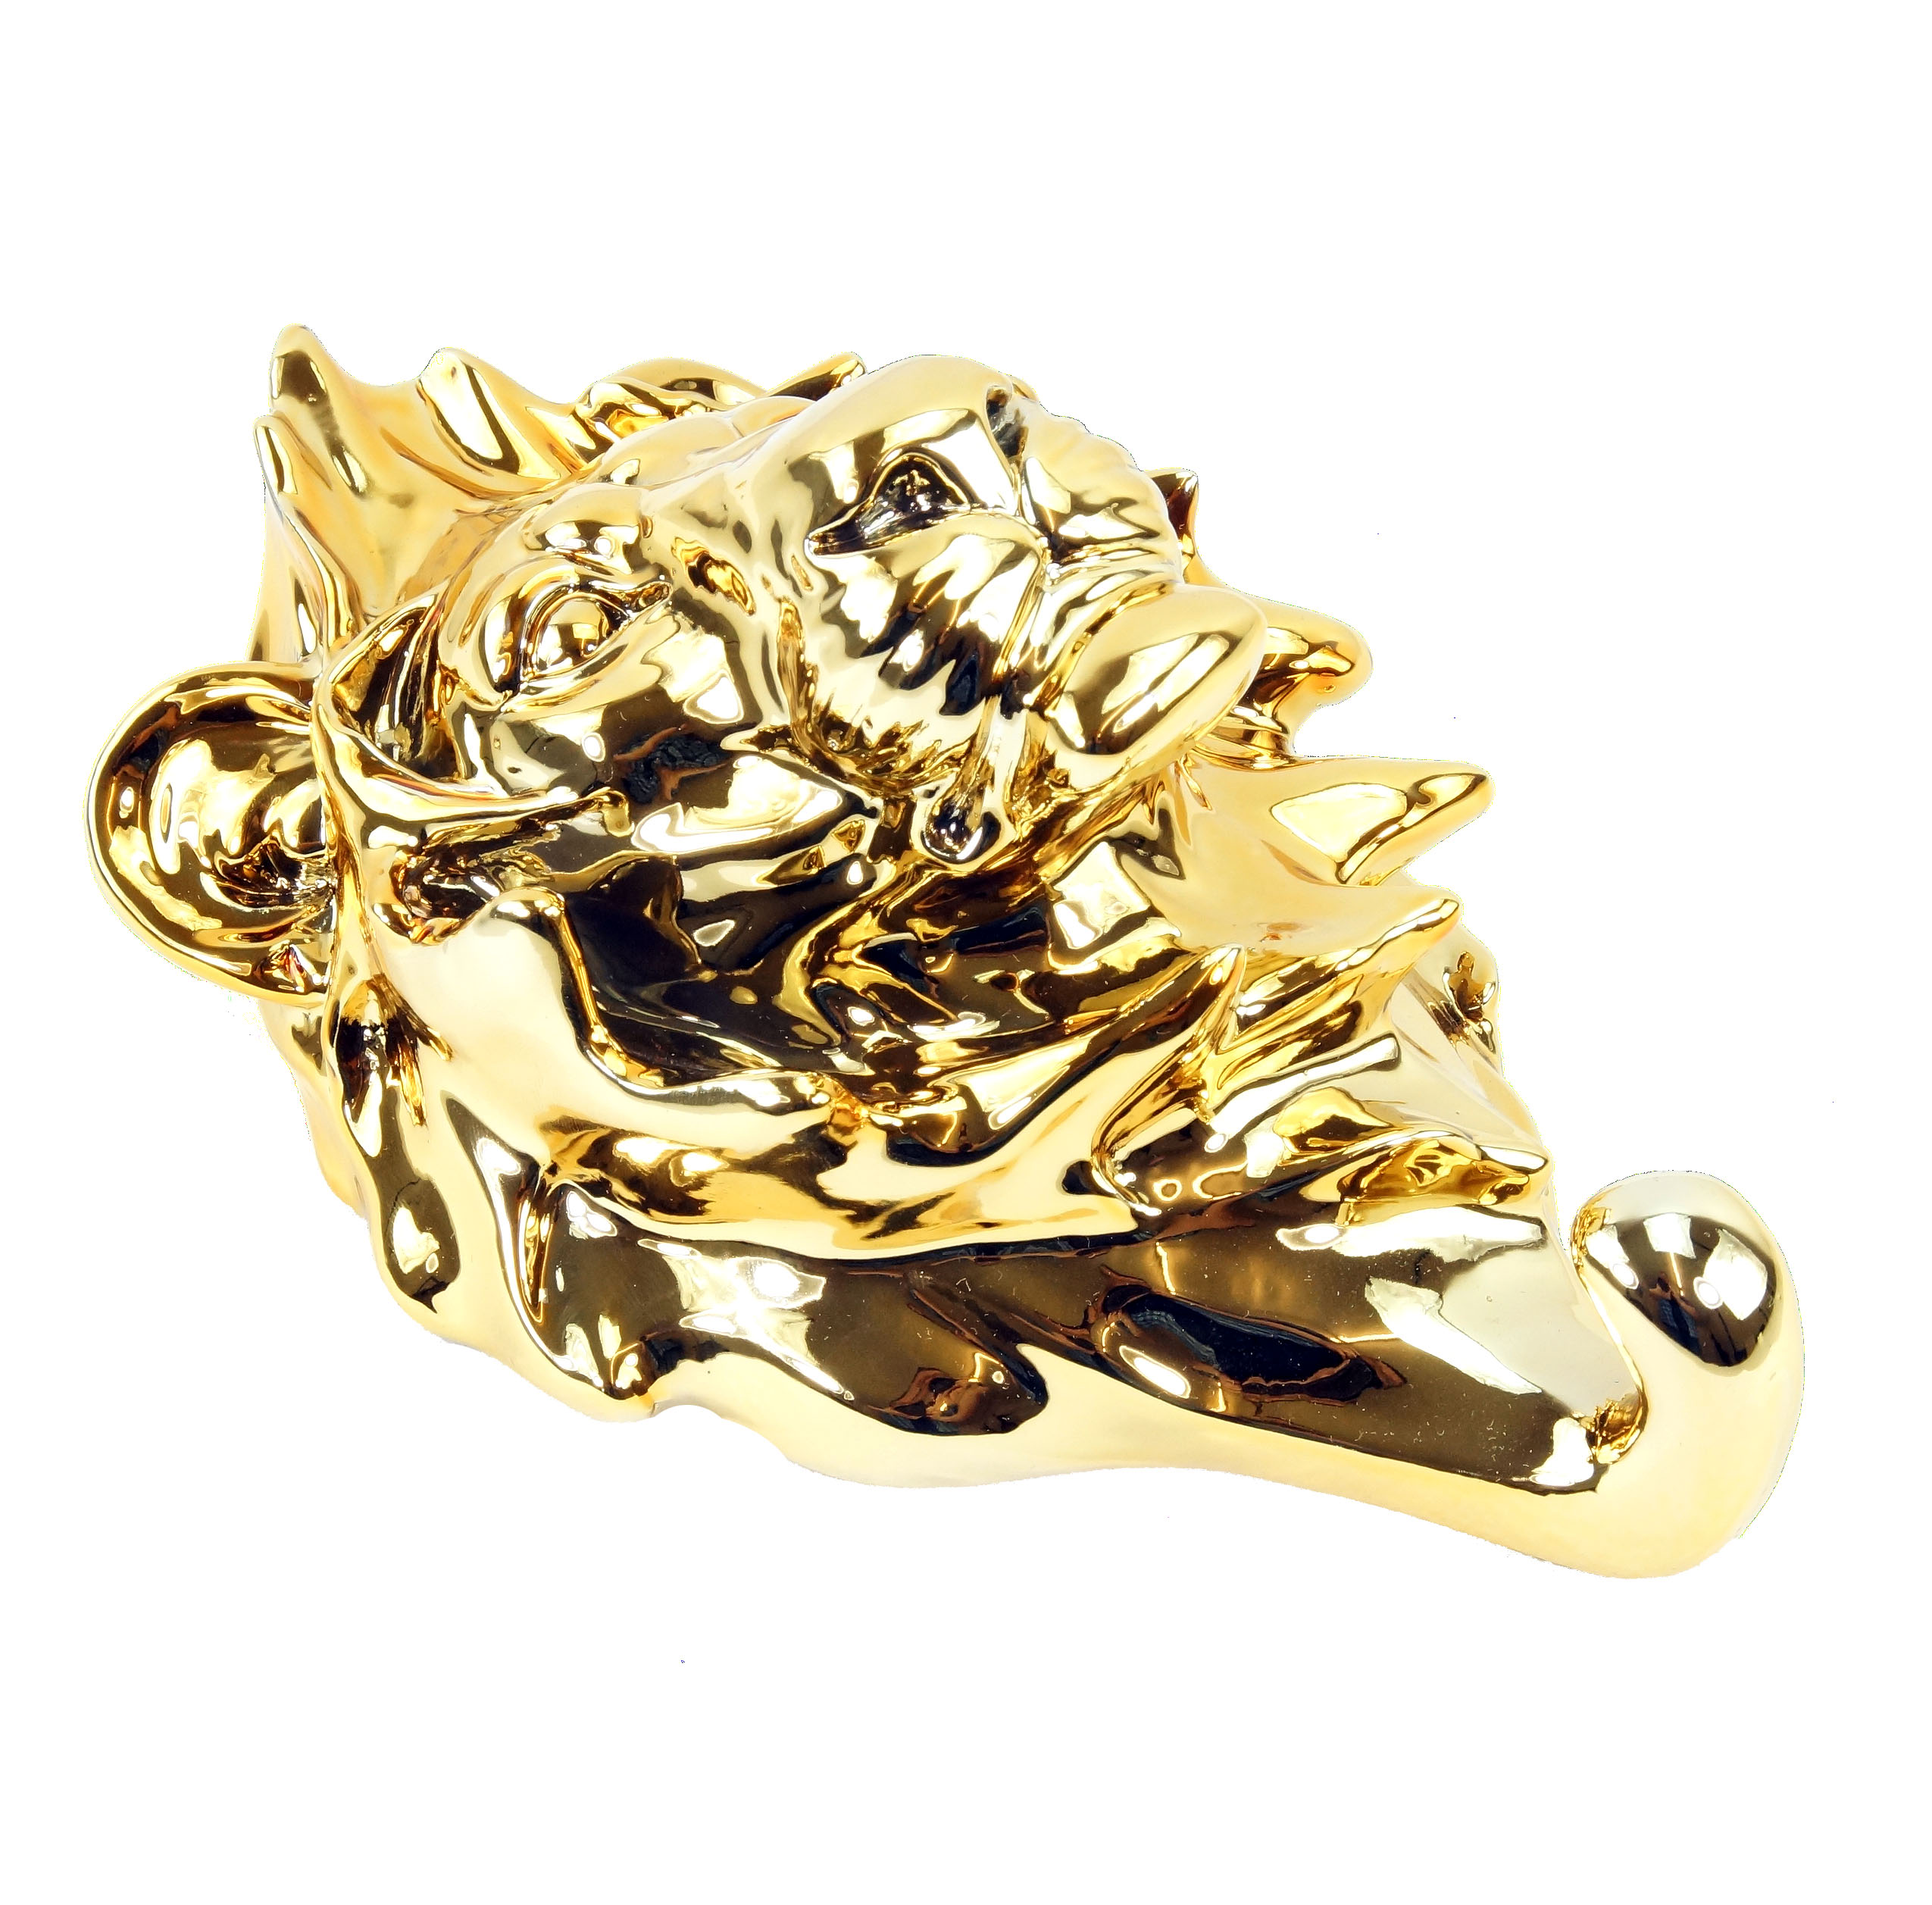 Goldene Löwenkopf Handtuchhalter Limitierter Wandhaken